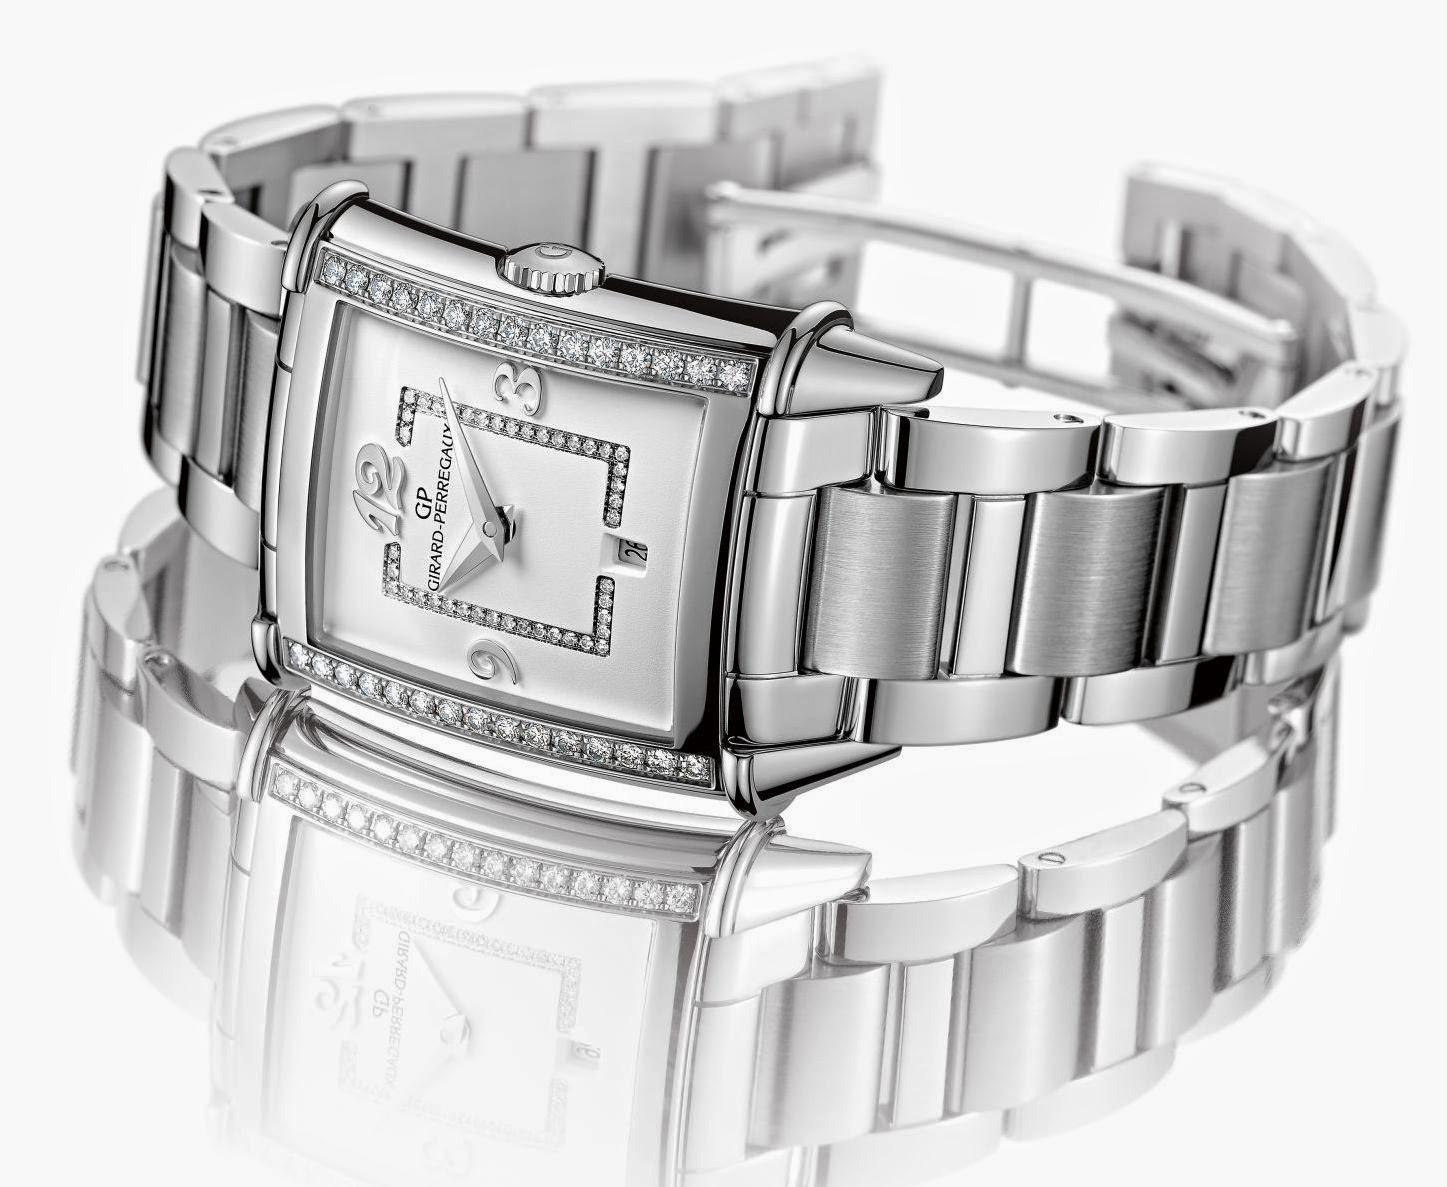 Naziv: girard-perregaux-vintage-1945-lady-edition-2014-watch-satovi-6.jpg, pregleda: 1010, veličina: 197,8 KB